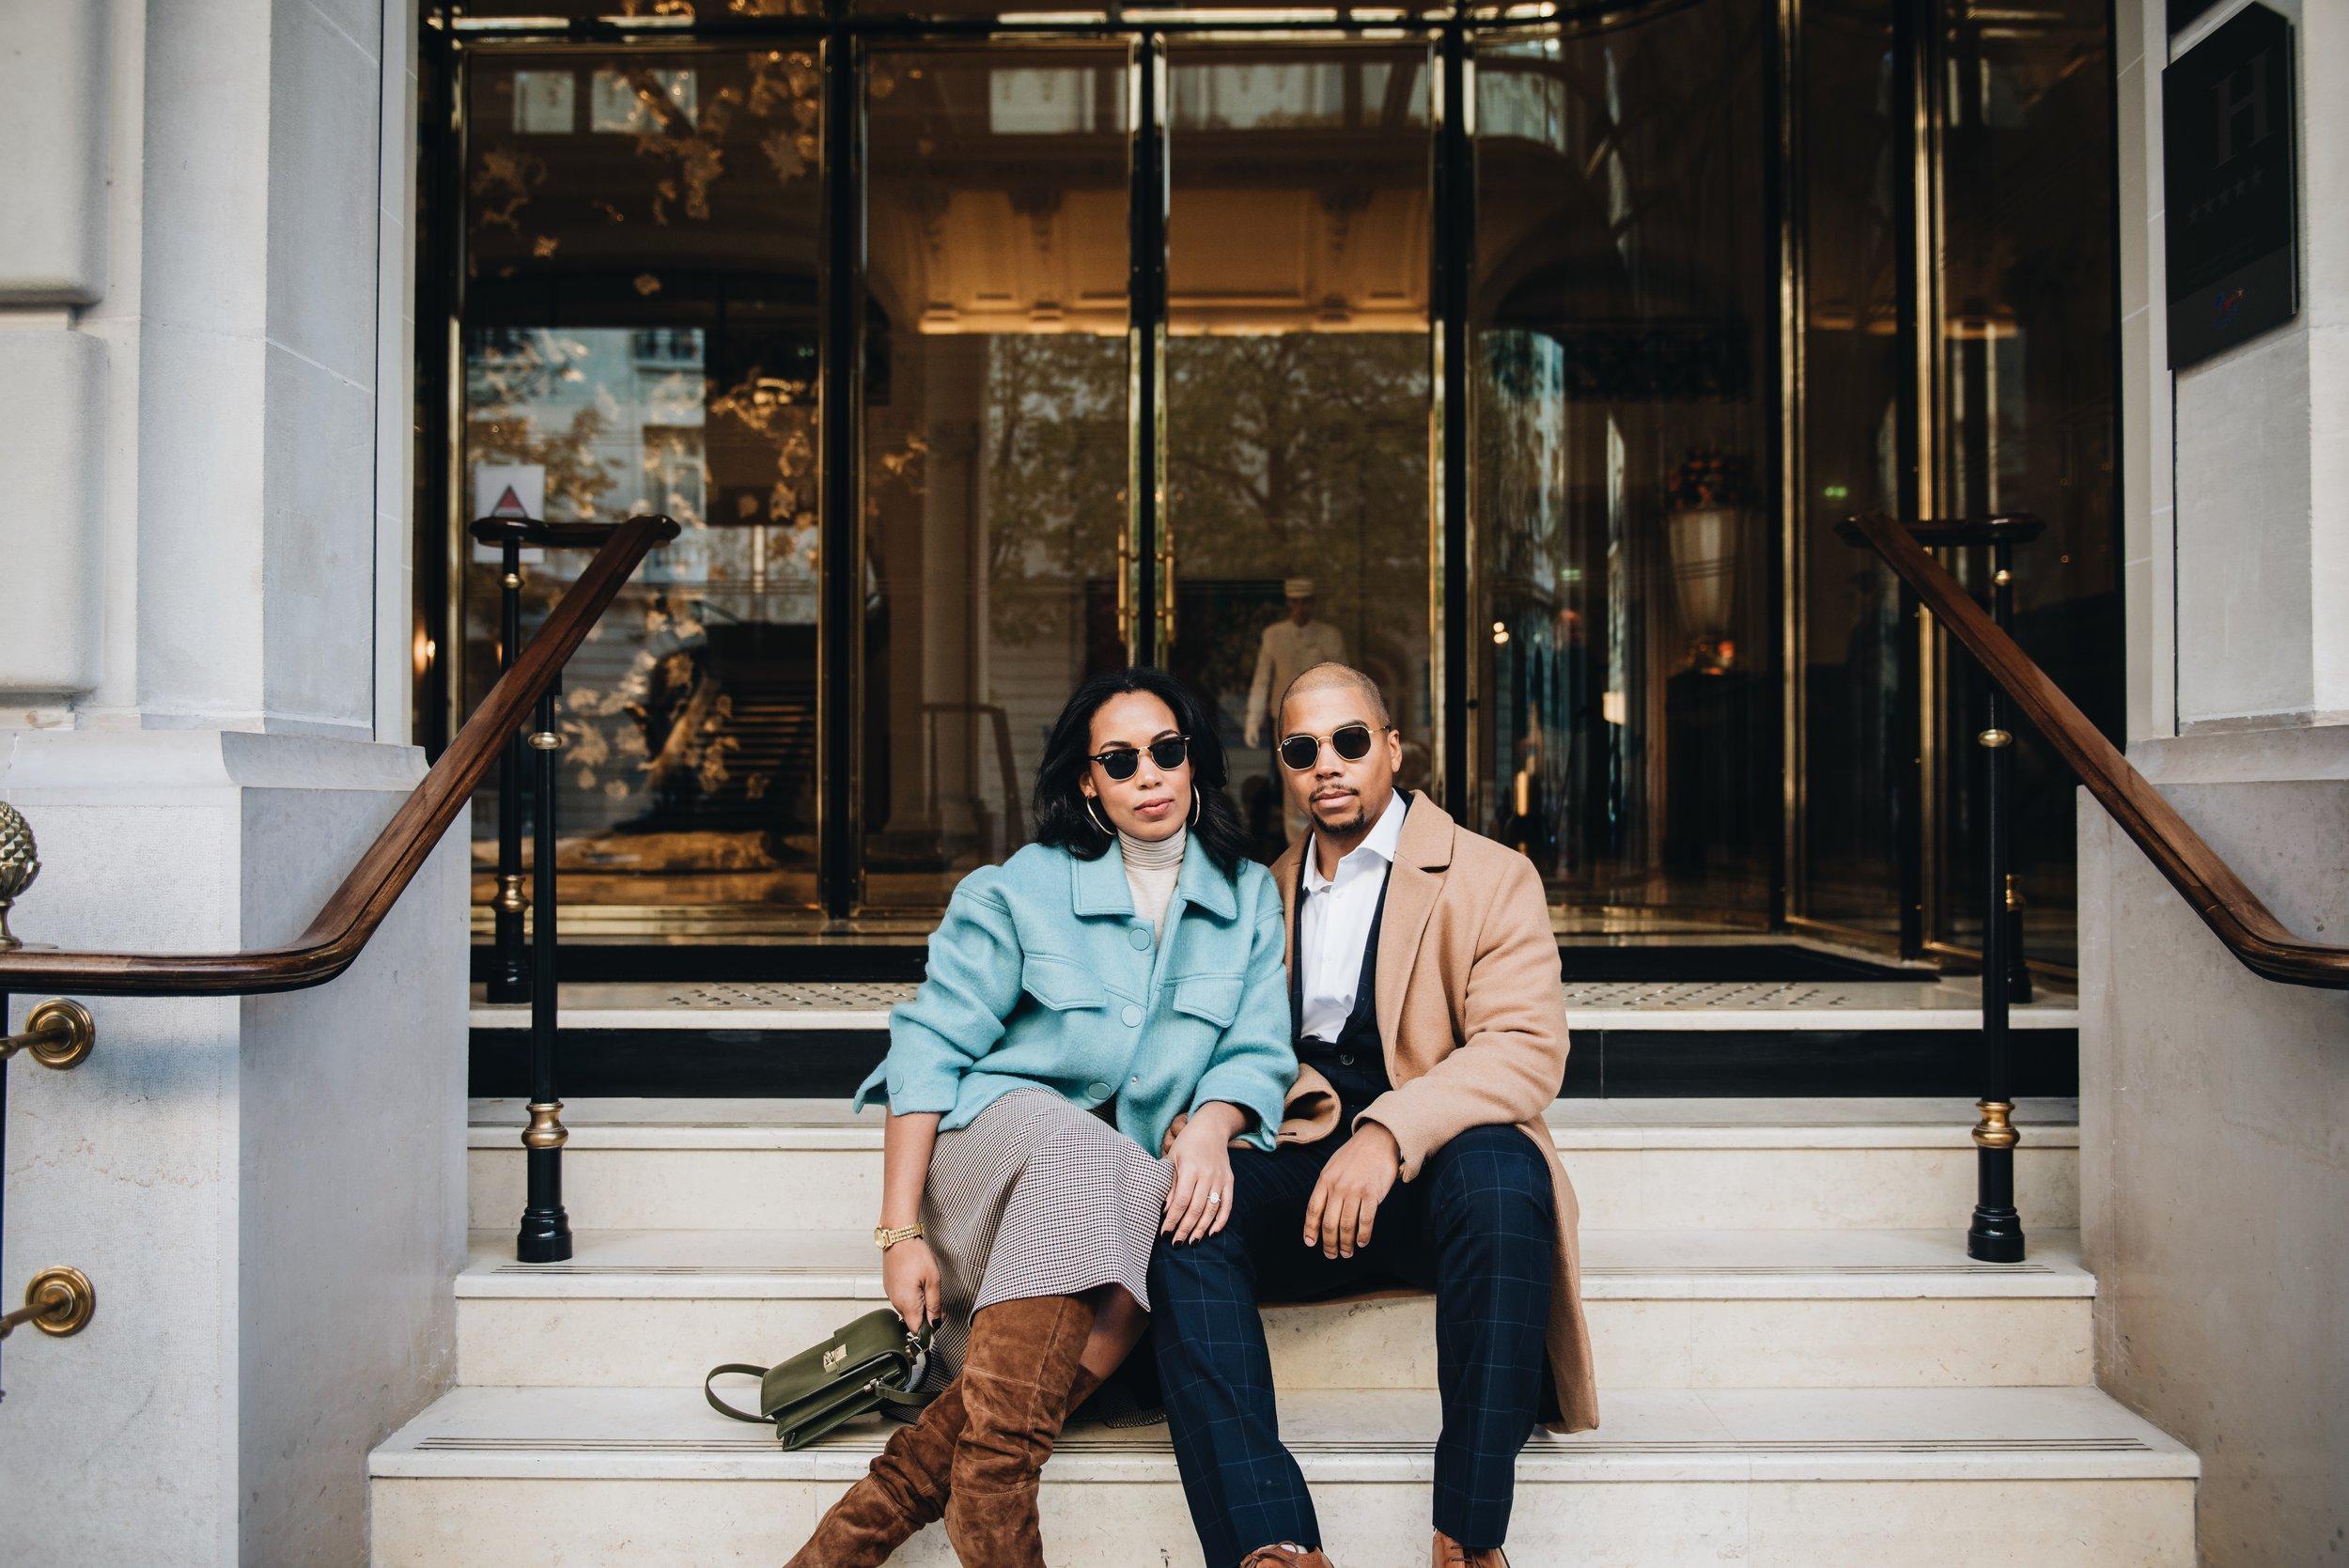 mango-wool-coat-zara-plaid-button-skirt-steve-madden-dakota-suede-brown-boot-rayban-clubmasters-hexagonal-flat-lens-urban-outfitters-camel-mens-coat-banana-republic-navy-slim-suit-4.JPG